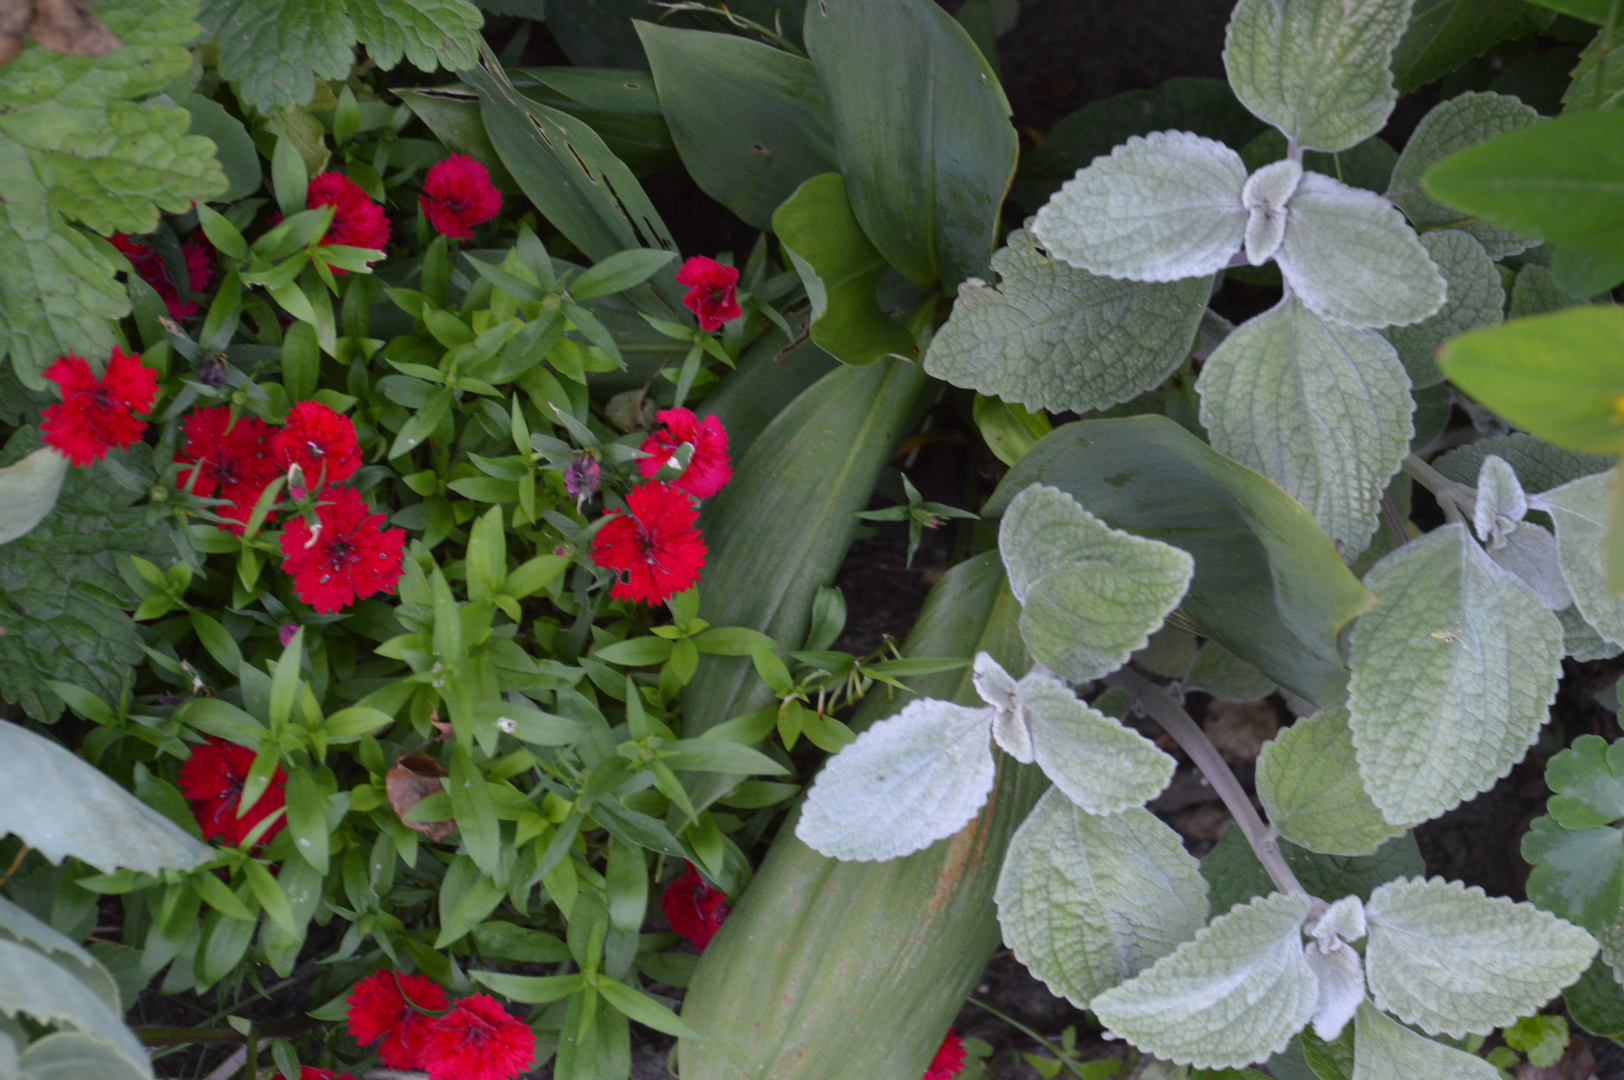 samt und seide foto bild pflanzen pilze flechten bl ten kleinpflanzen gartenpflanzen. Black Bedroom Furniture Sets. Home Design Ideas